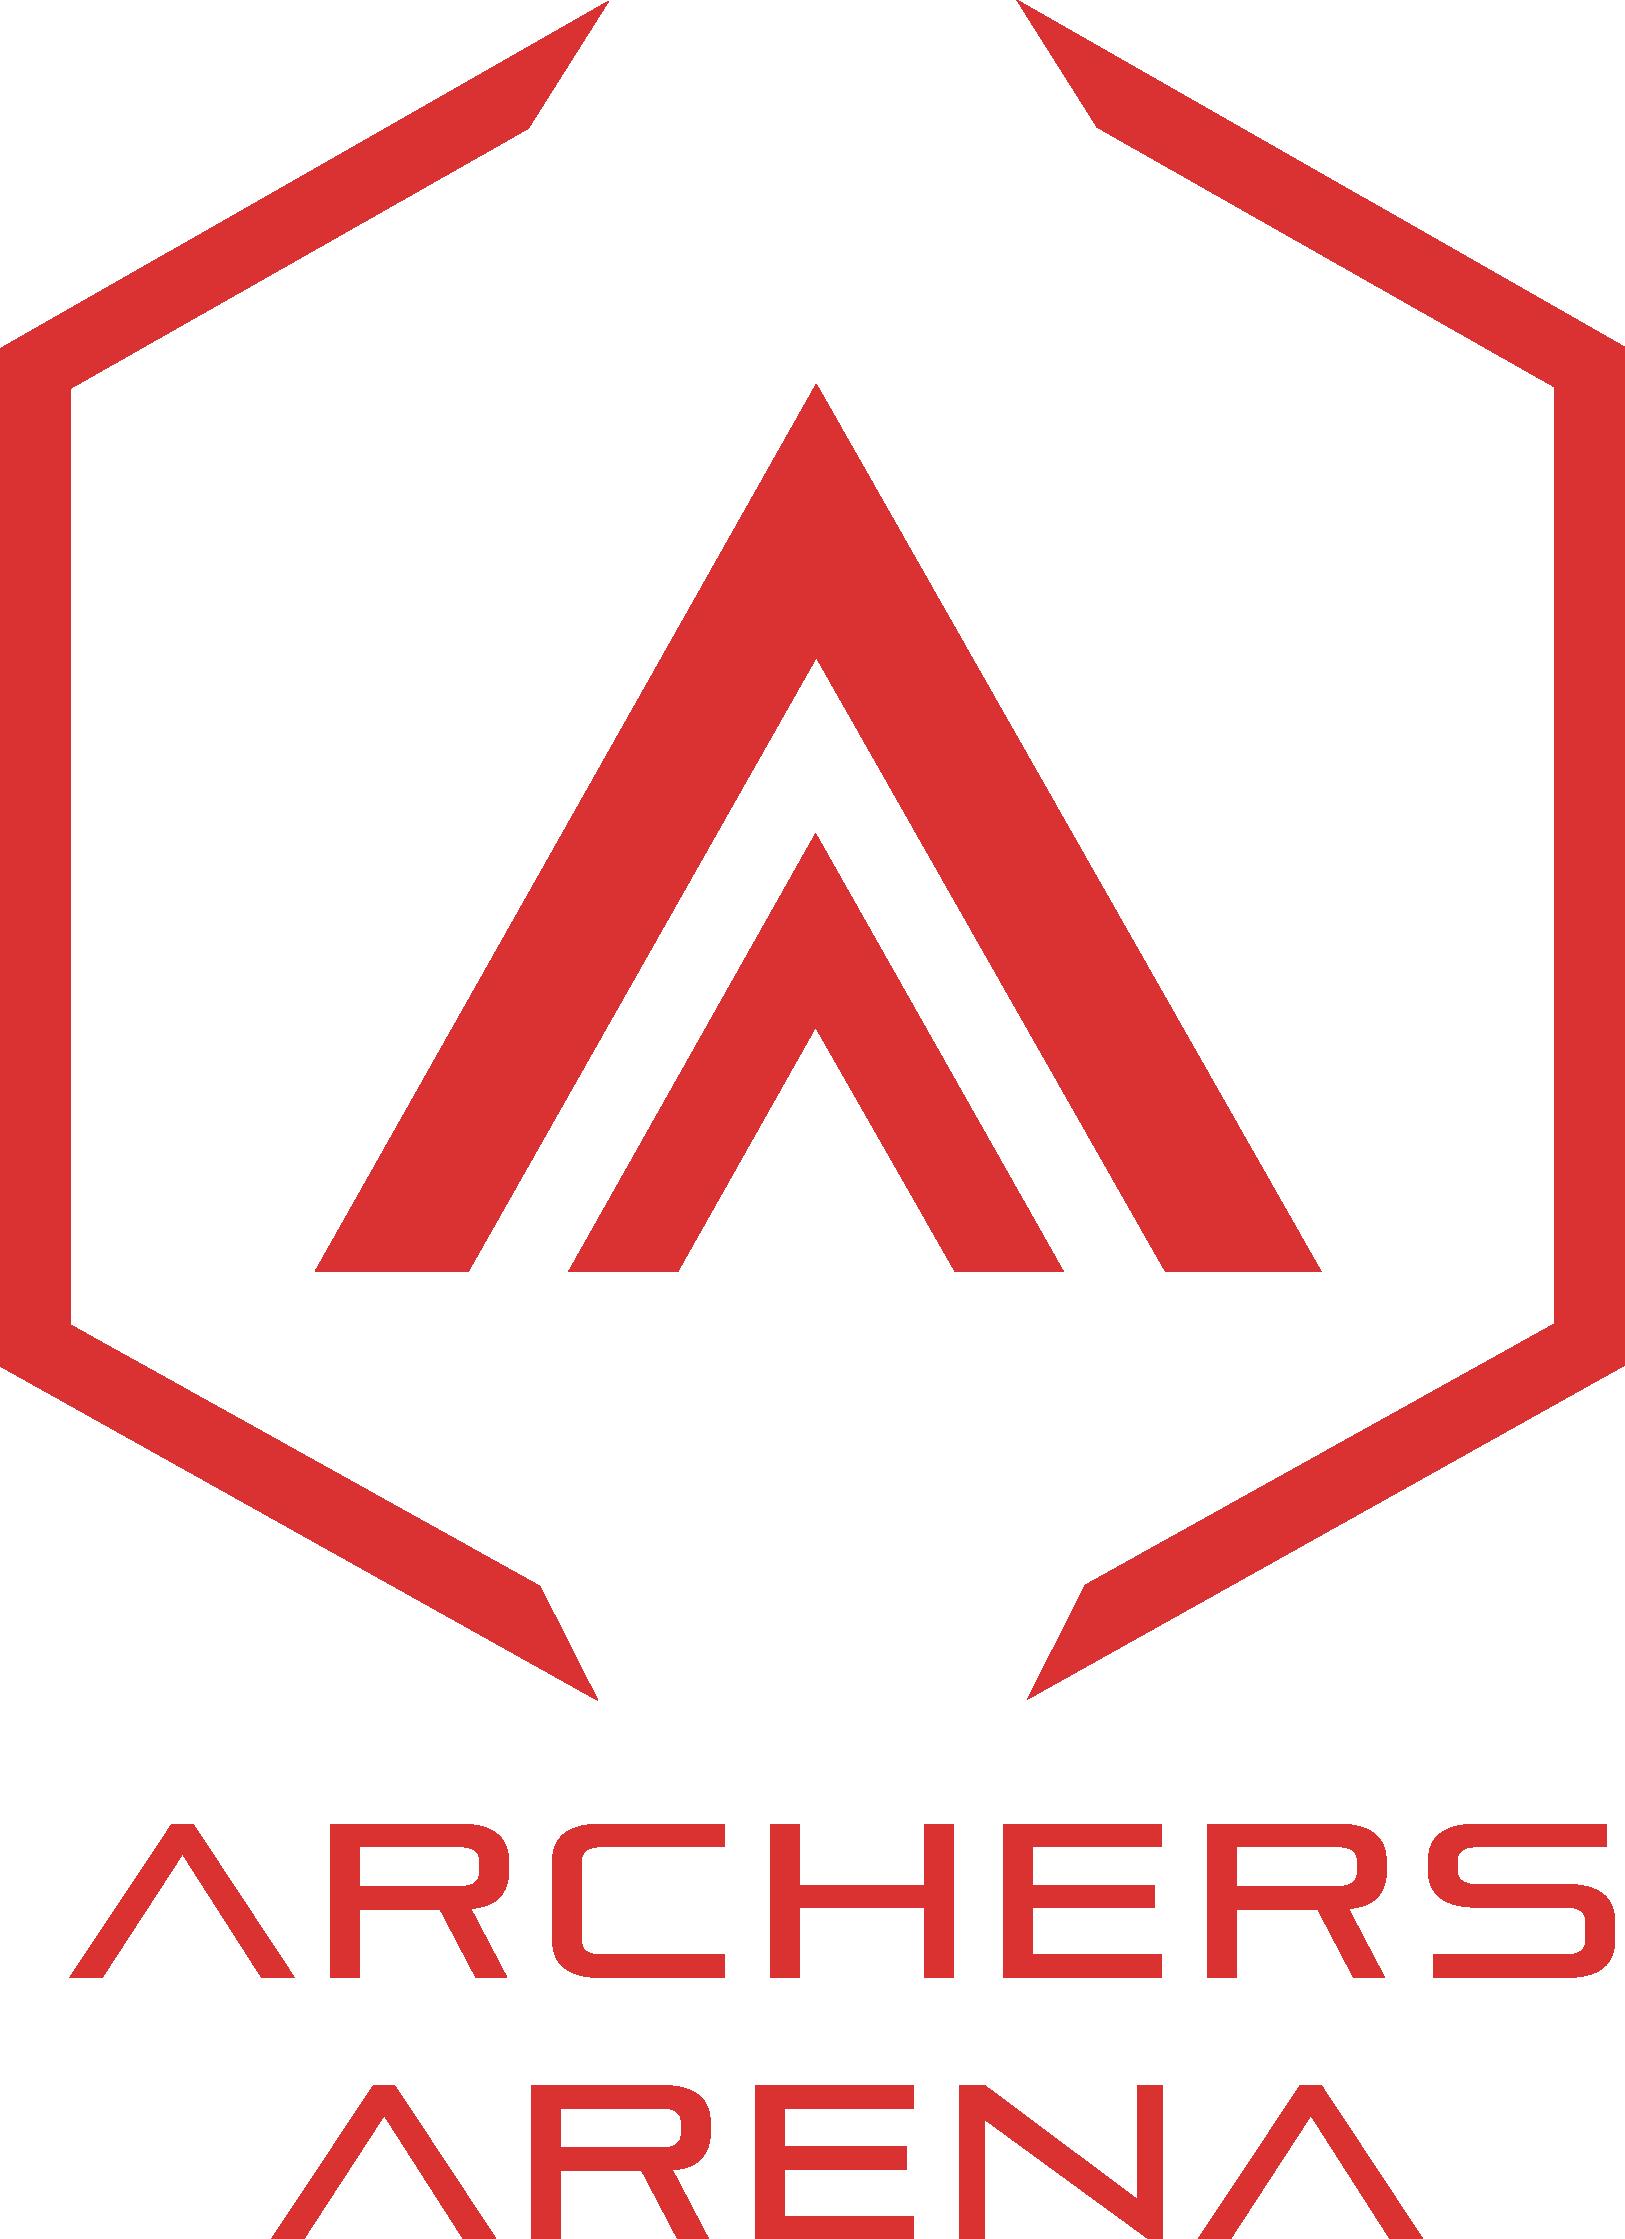 ArchersArena_LOGOFINAL